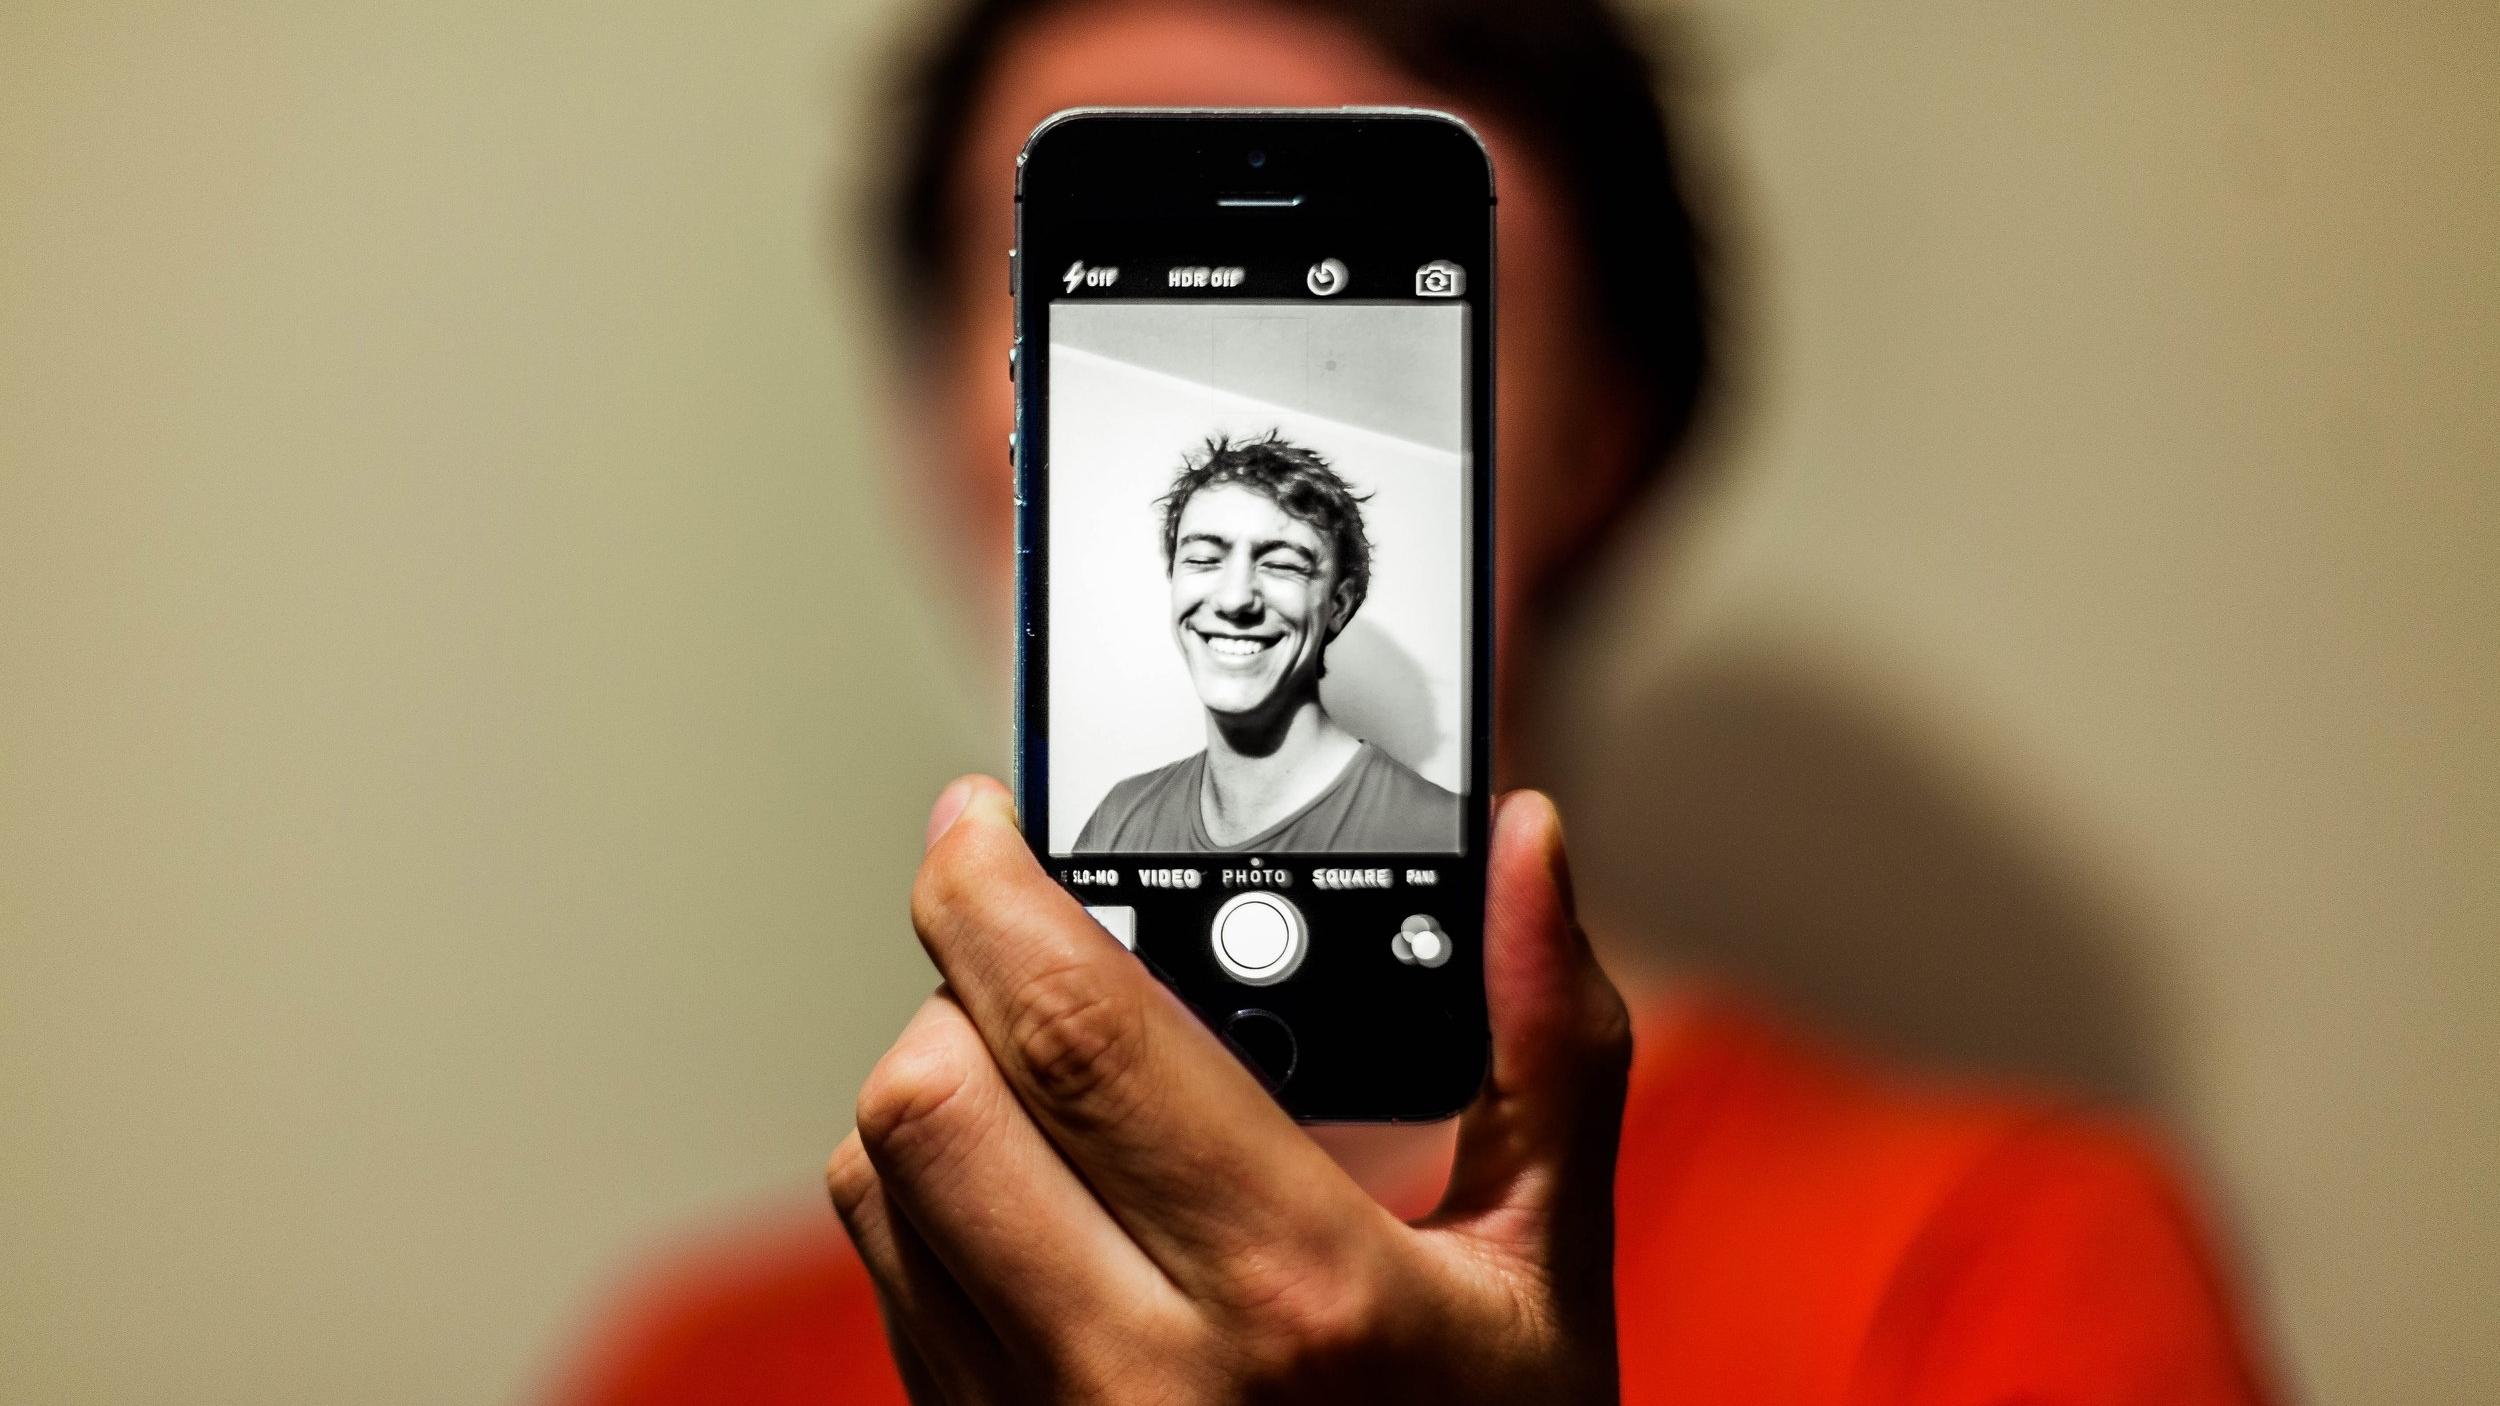 TAKE A PHOTO WITH SMARTPHONE CAMERA